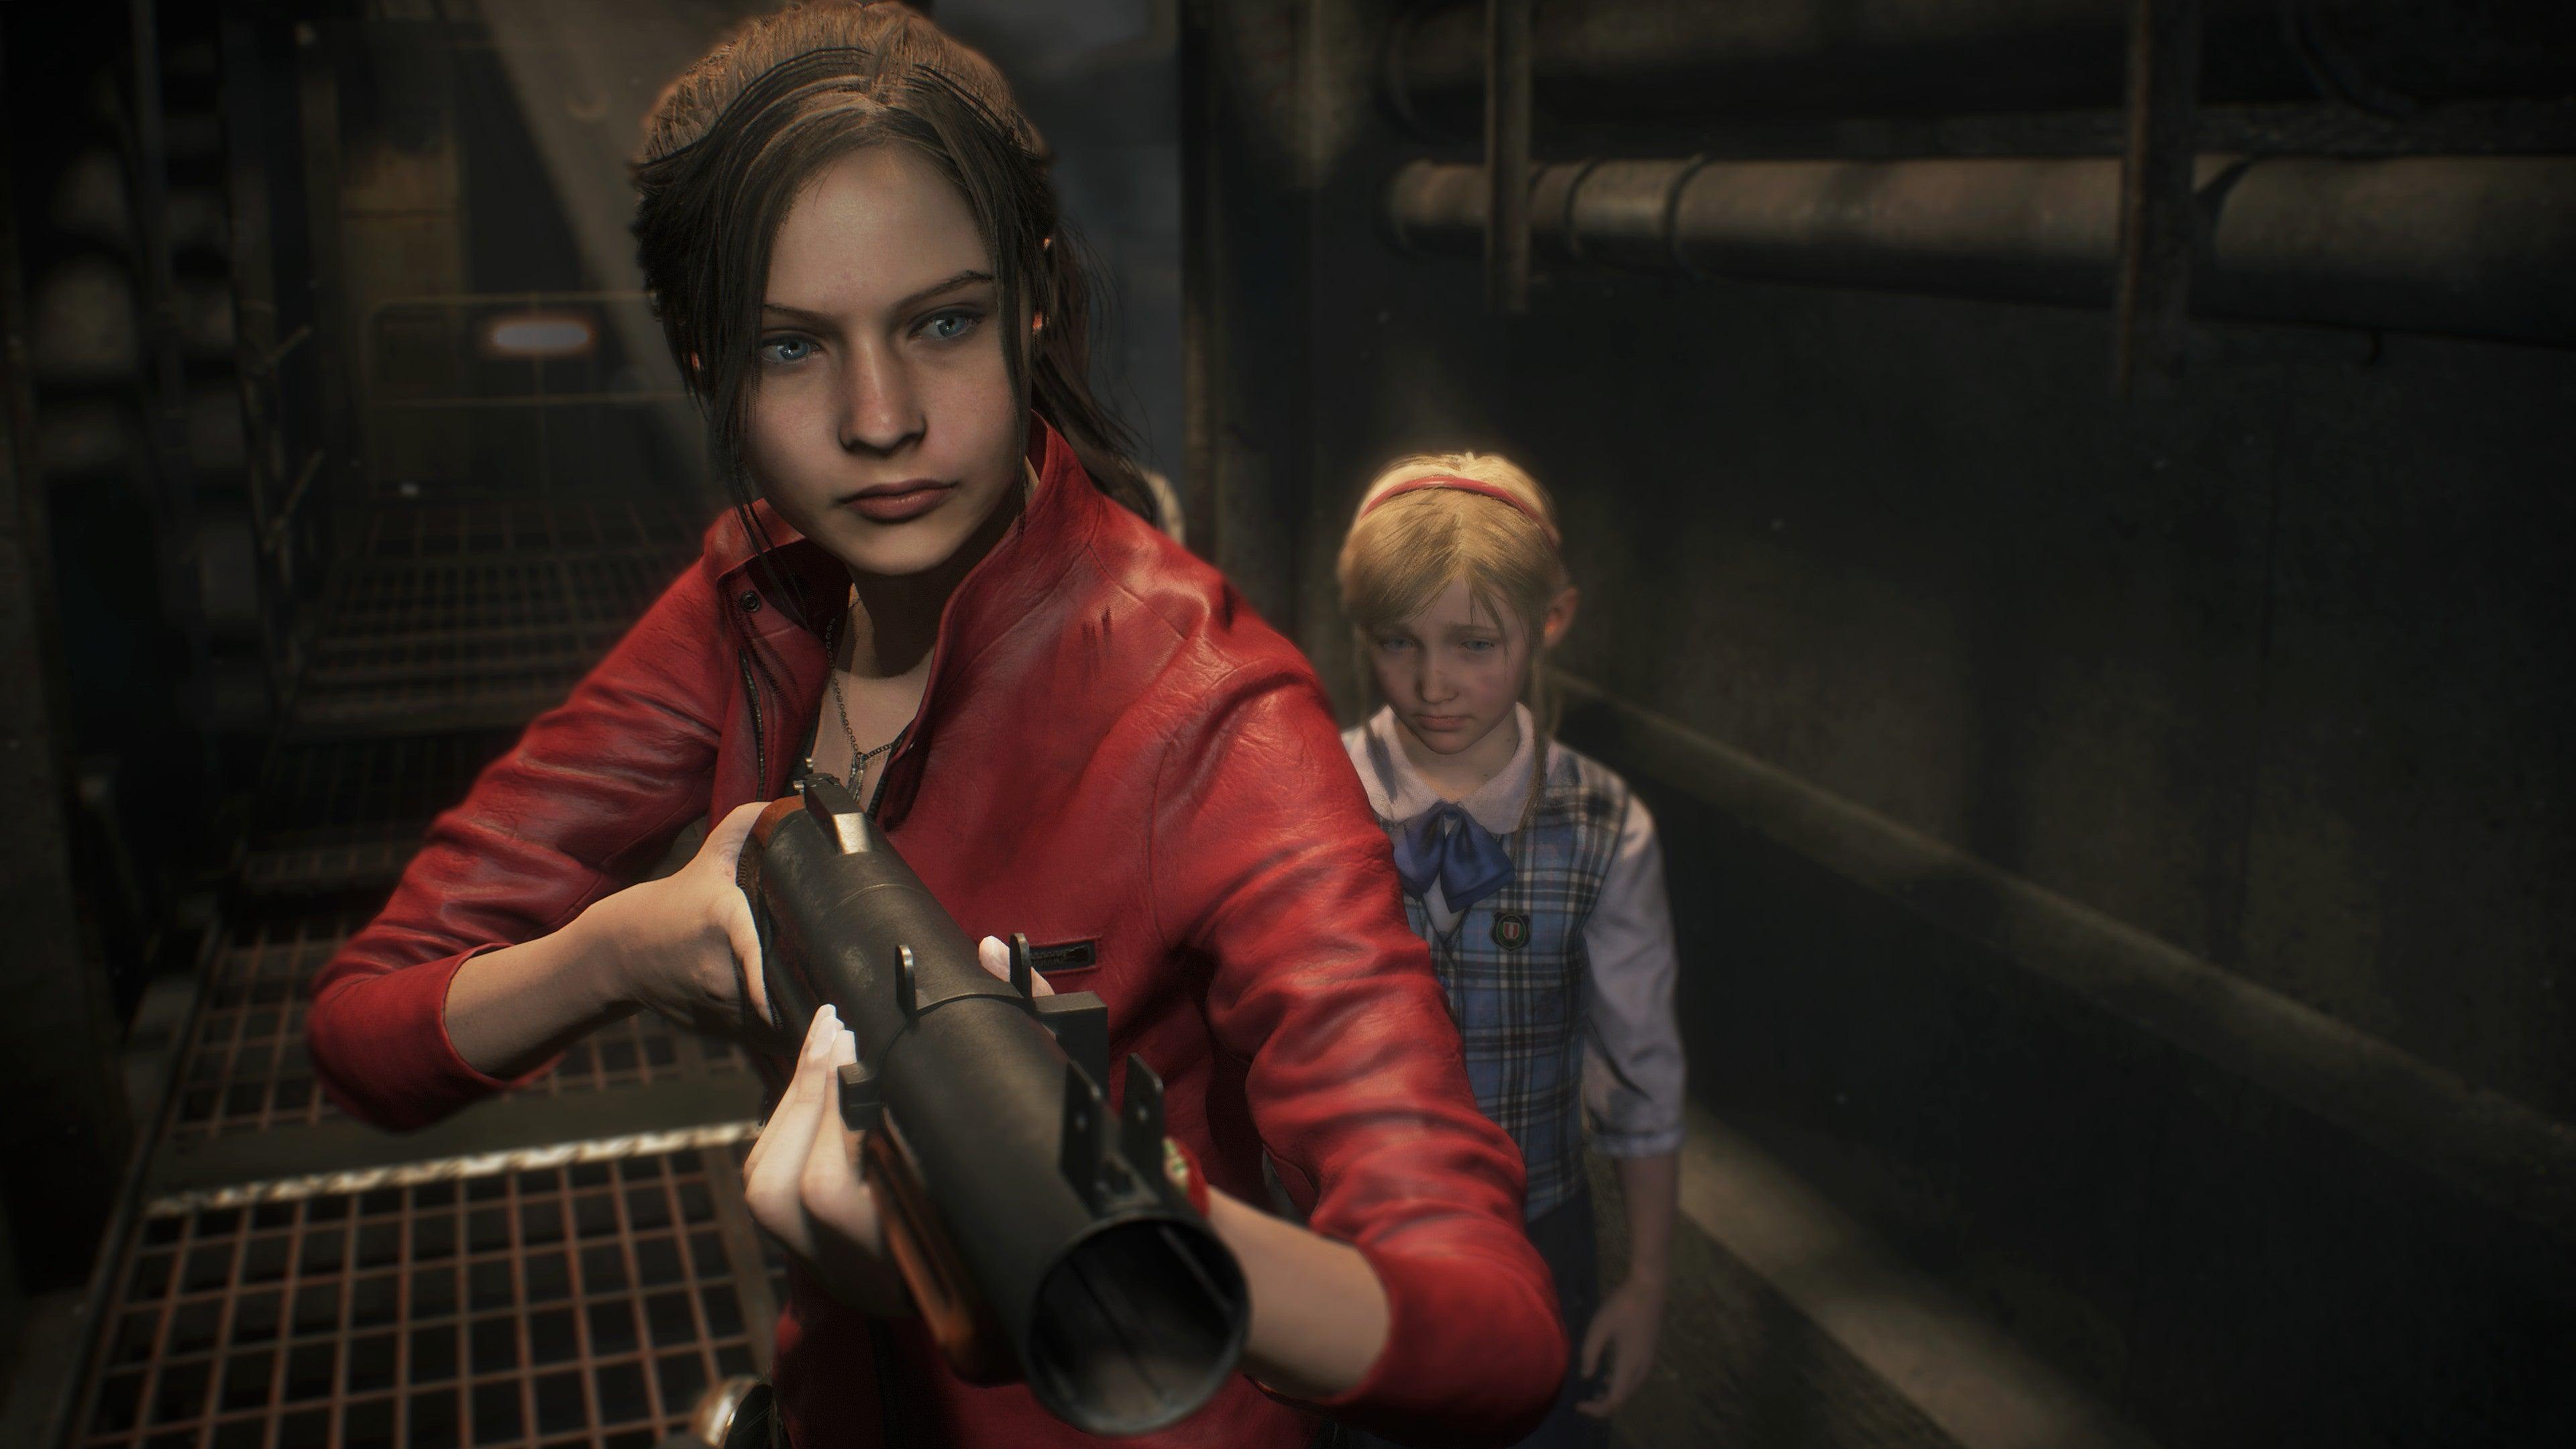 Image for Resident Evil 2 Remake Ending Unlock guide - True Ending, 4th Survivor Hunk, Tofu Mode